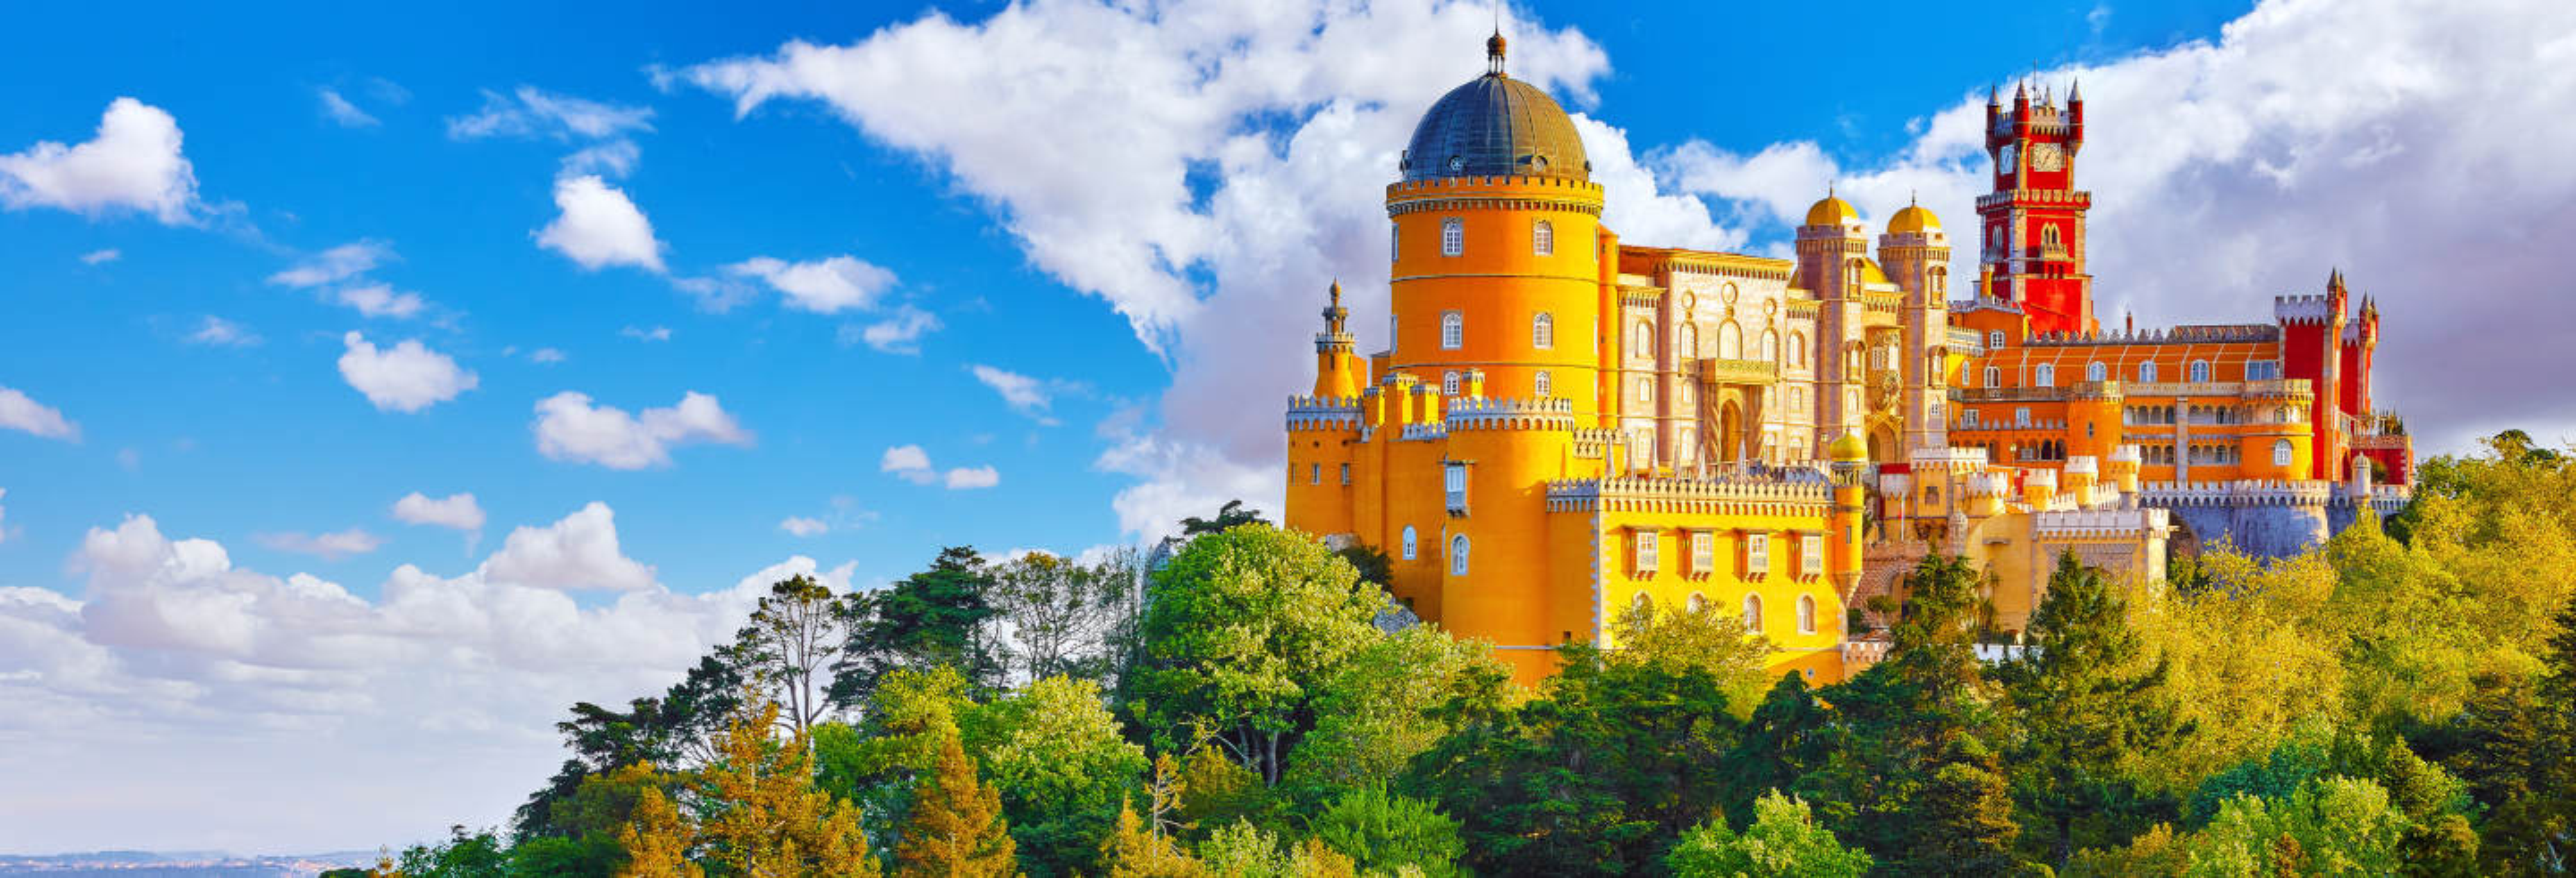 Tour privado por Sintra con guía en español